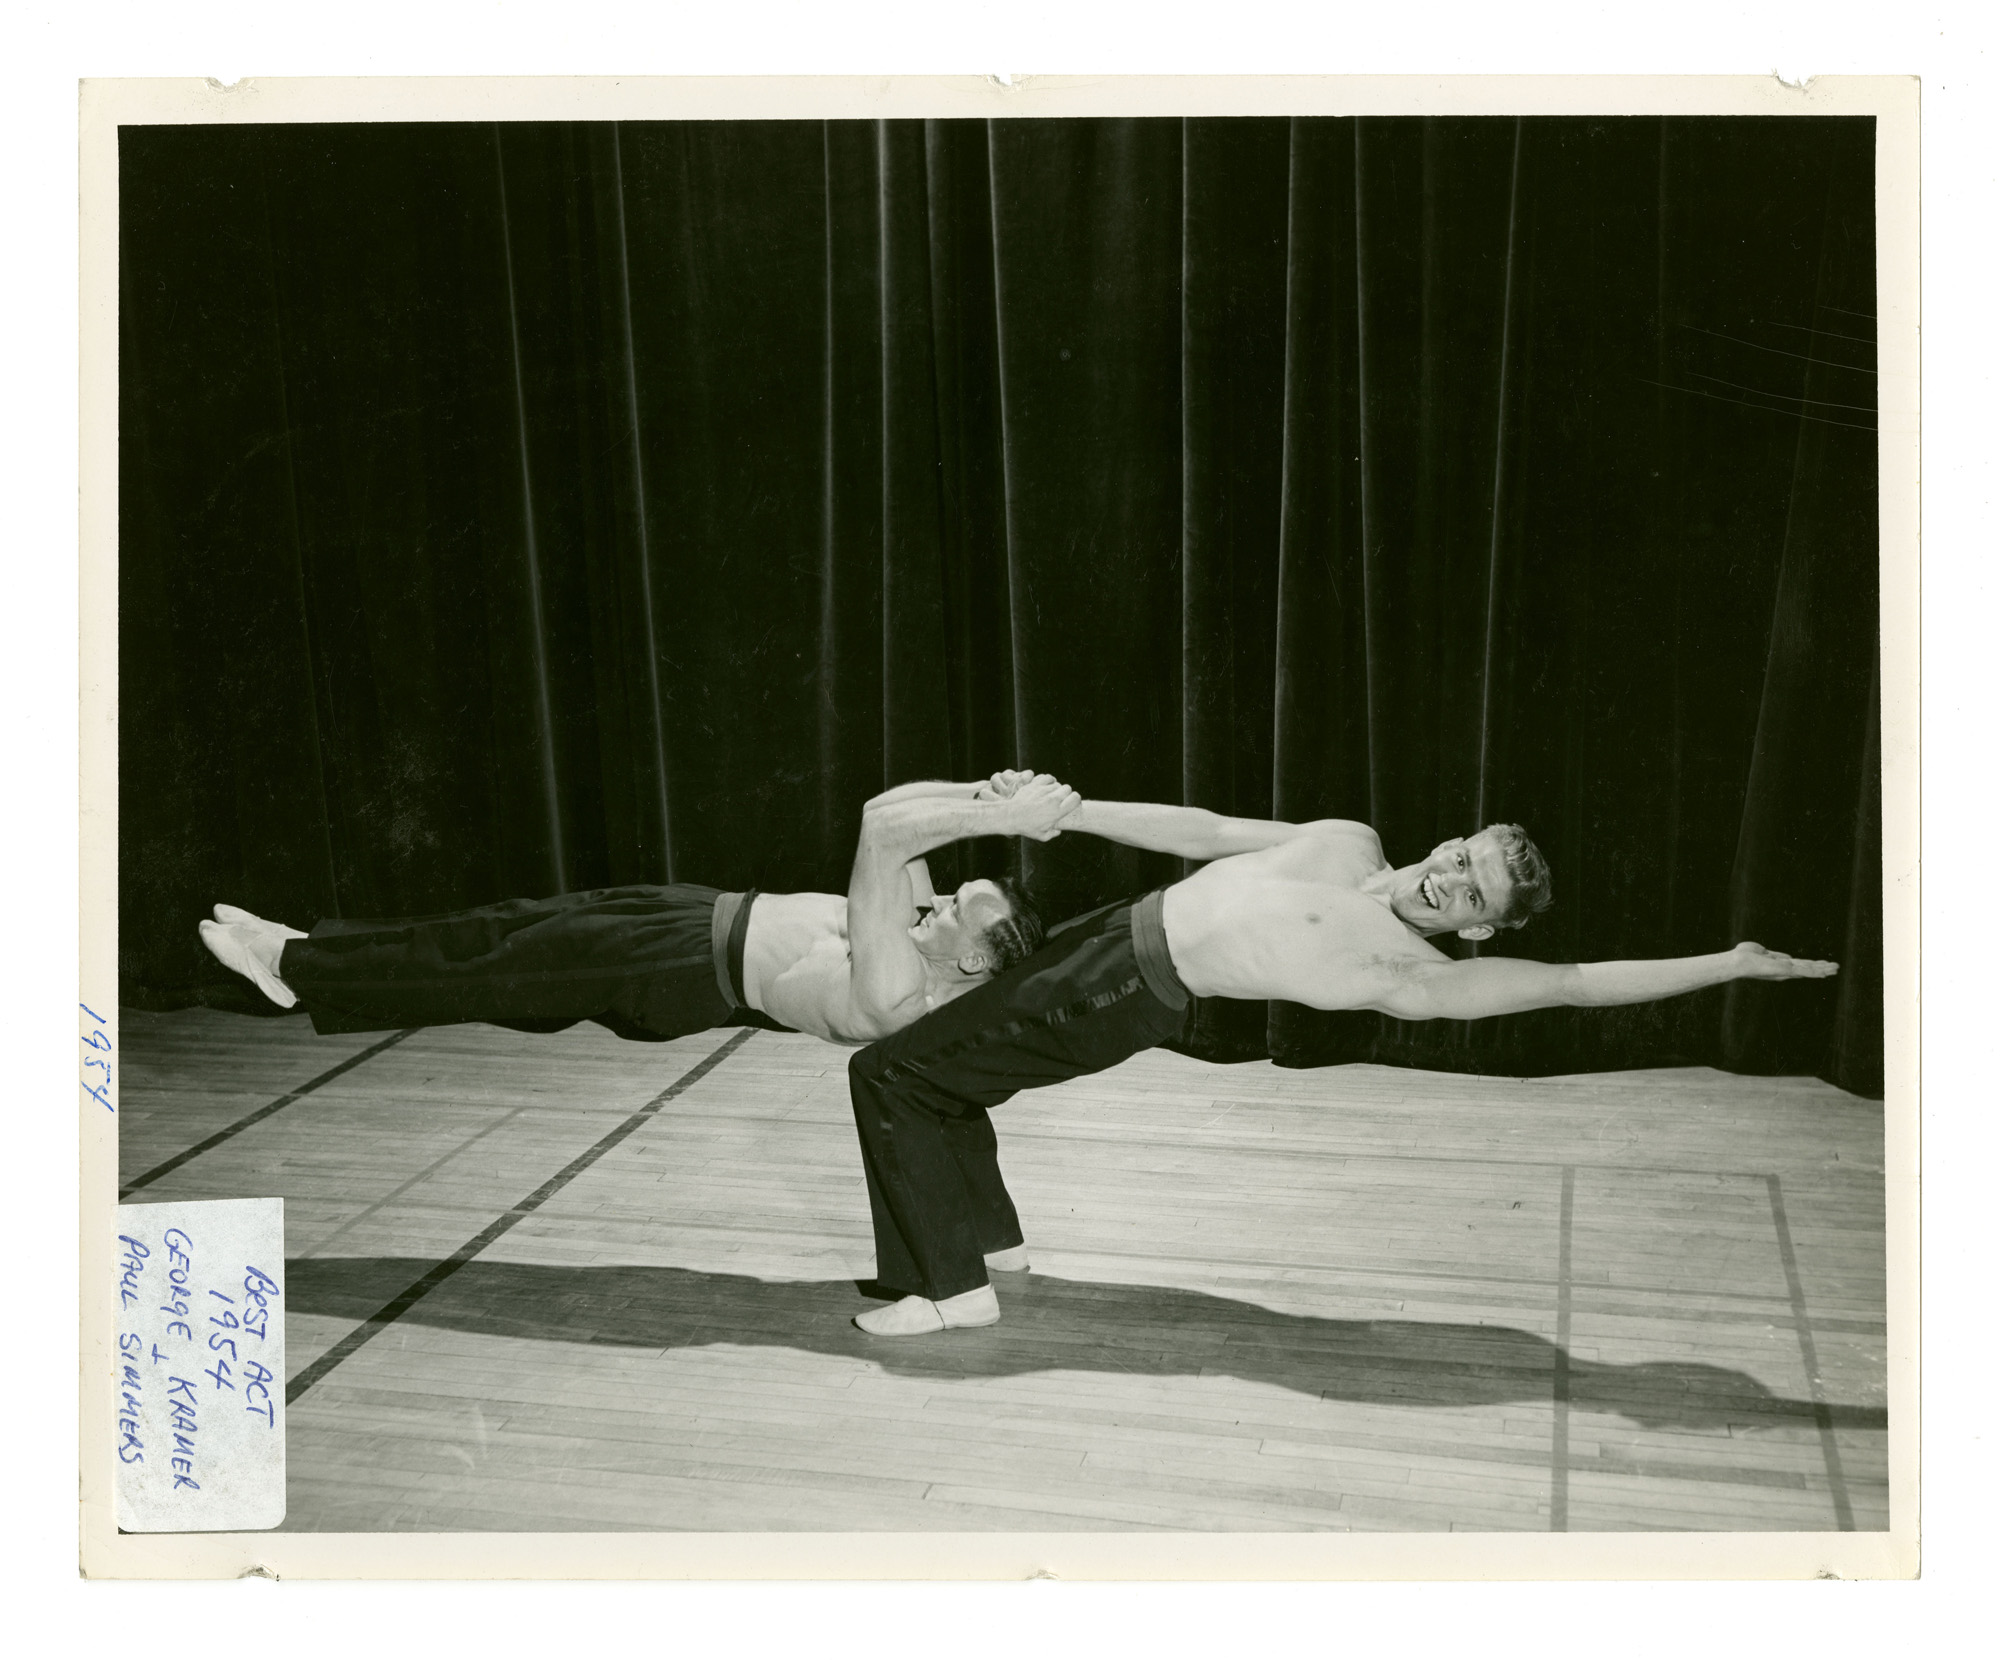 1954 - Men's Doubles Balancing